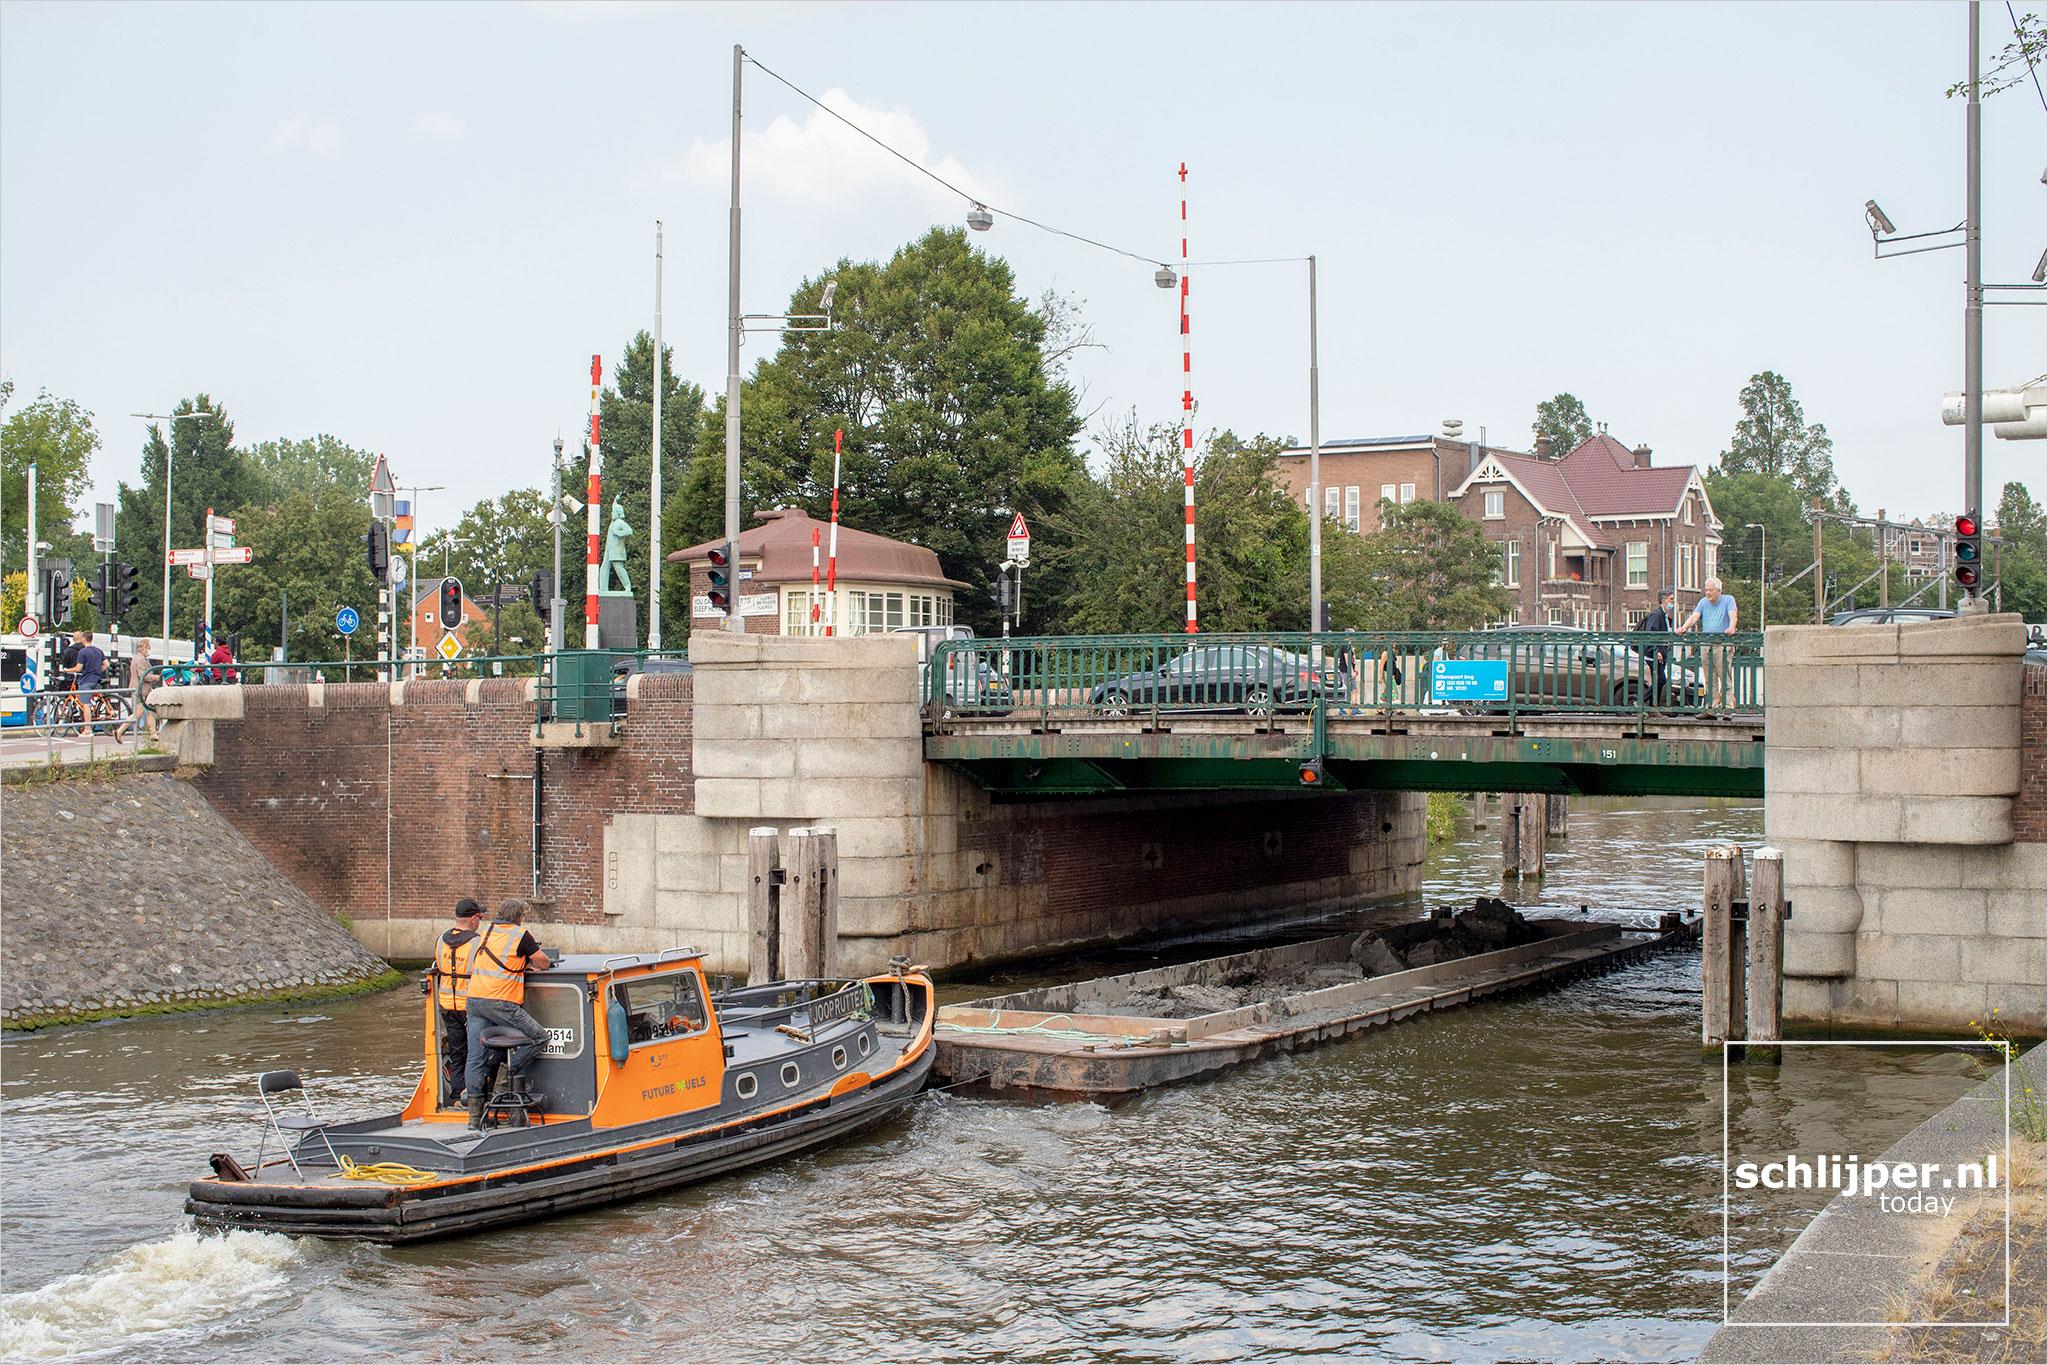 The Netherlands, Amsterdam, 21 juli 2021